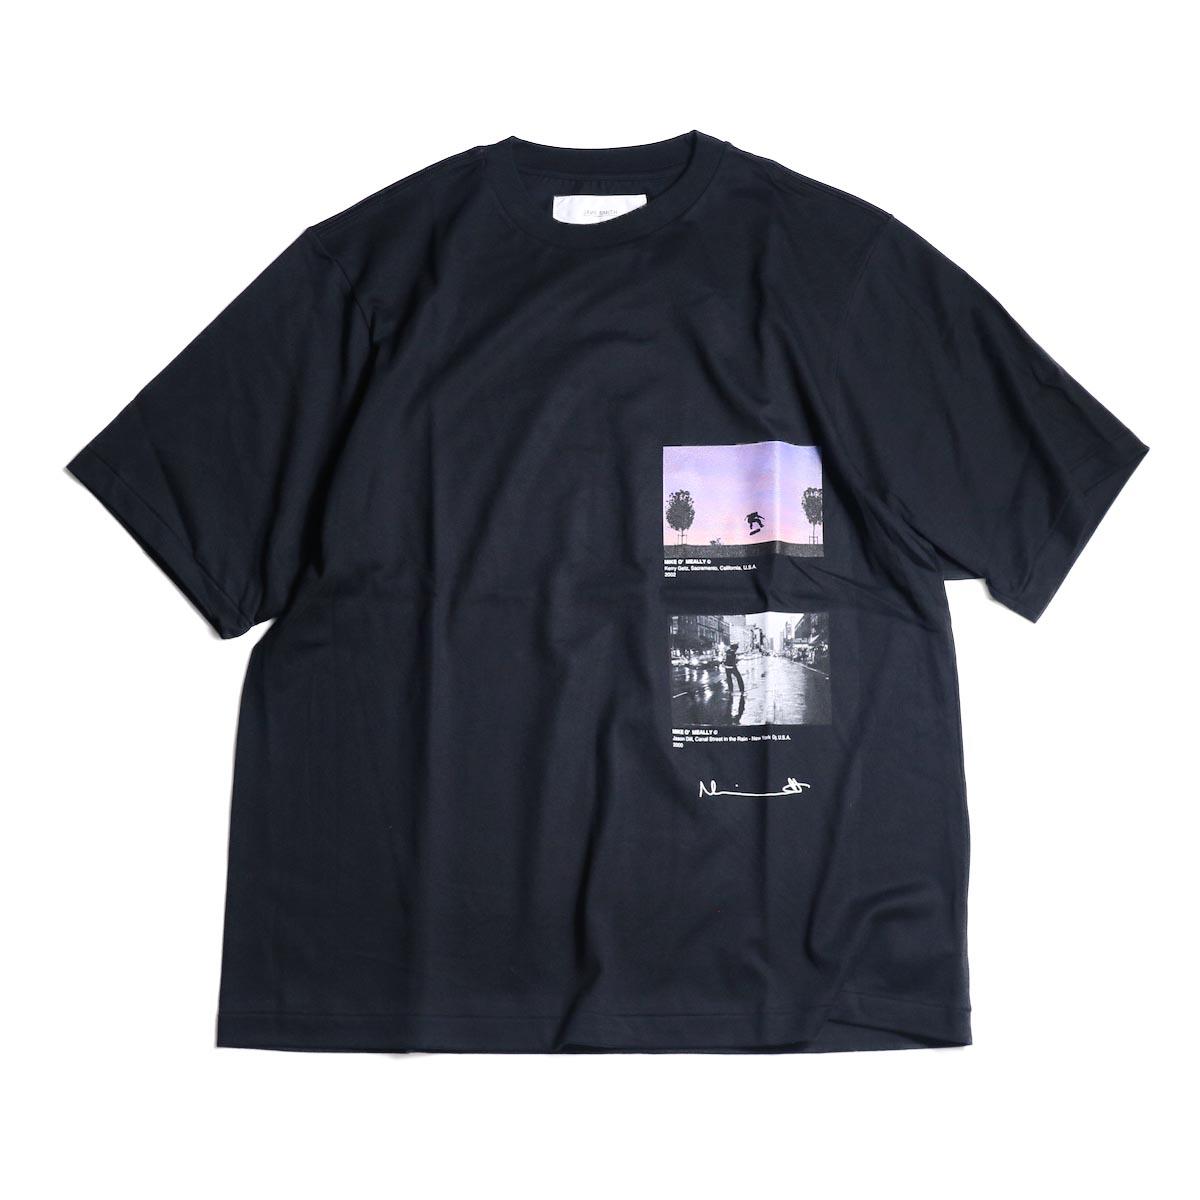 JANE SMITH / Print Tee (KERRY GETZ & JASON DULL,CANAL STREET IN THE RAIN S/S) -Black正面